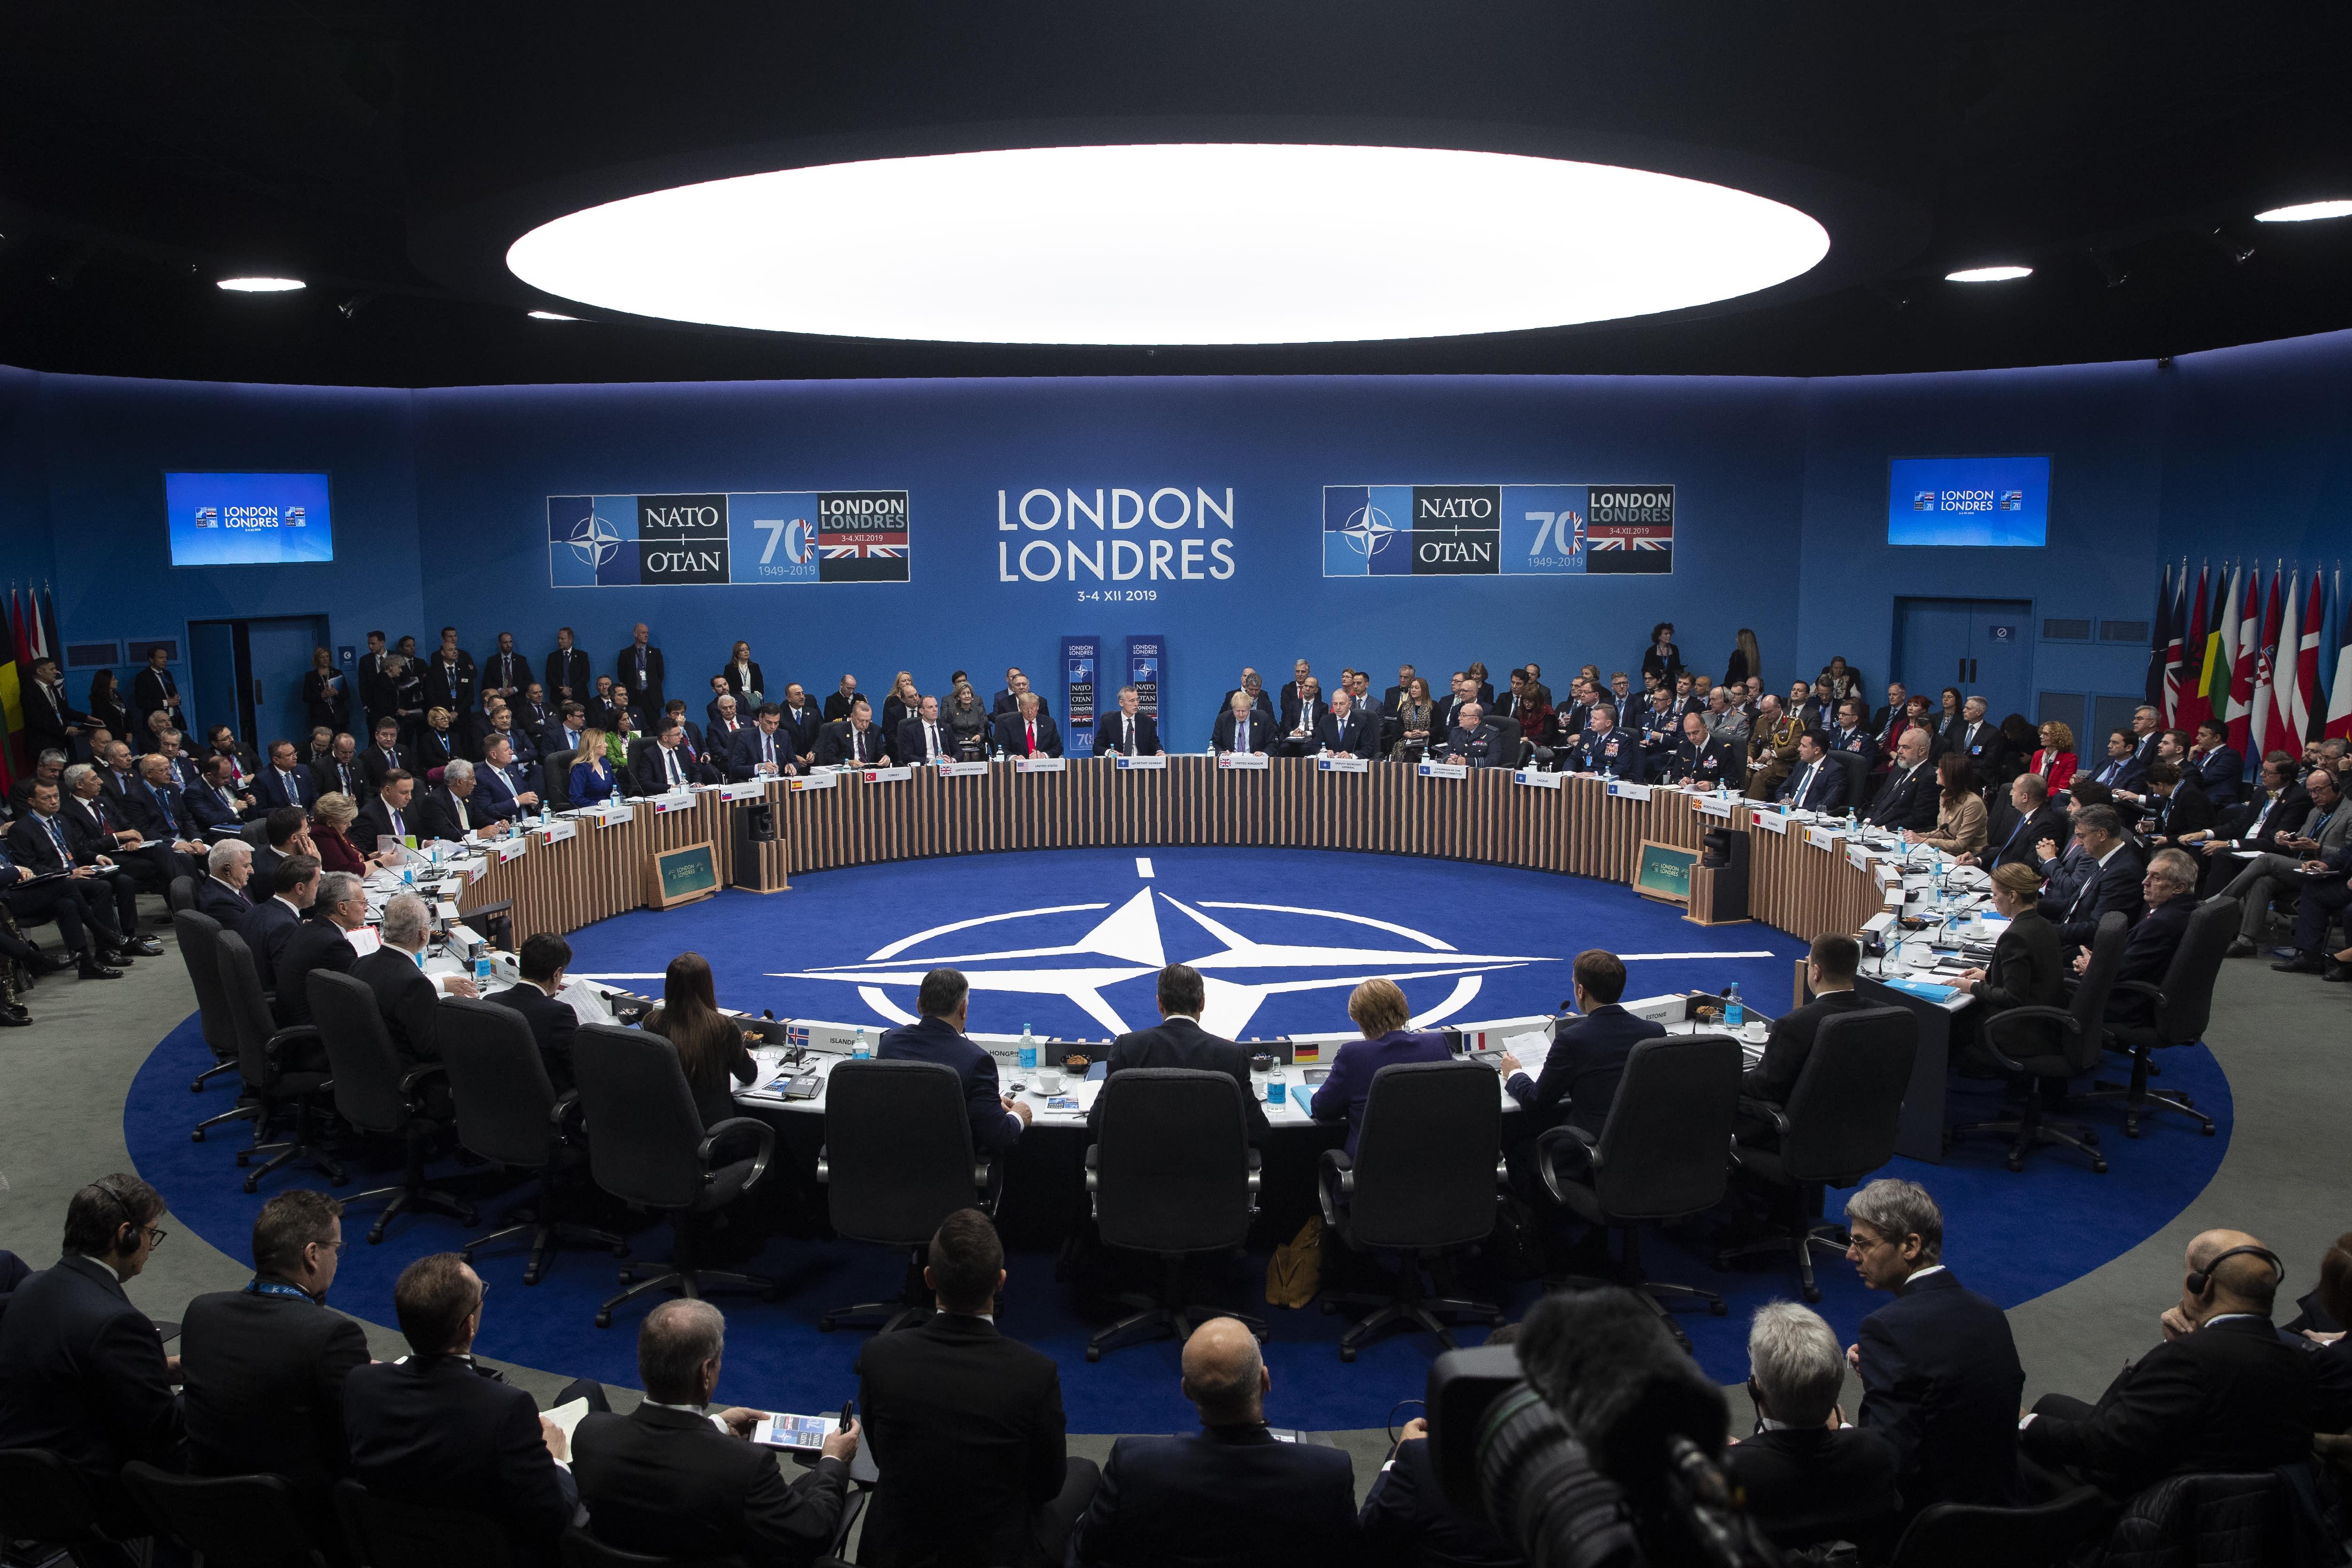 France-Turkey spat over Libya arms exposes NATO's limits - yahoo